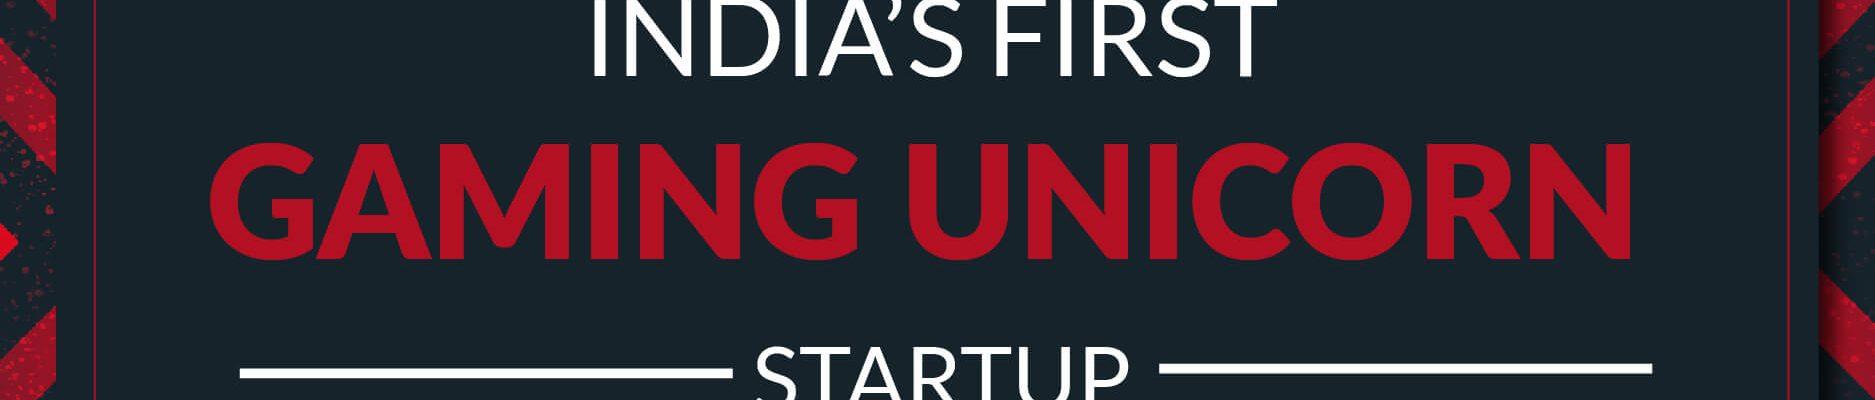 Dream 11 India first gaming unicorn startup